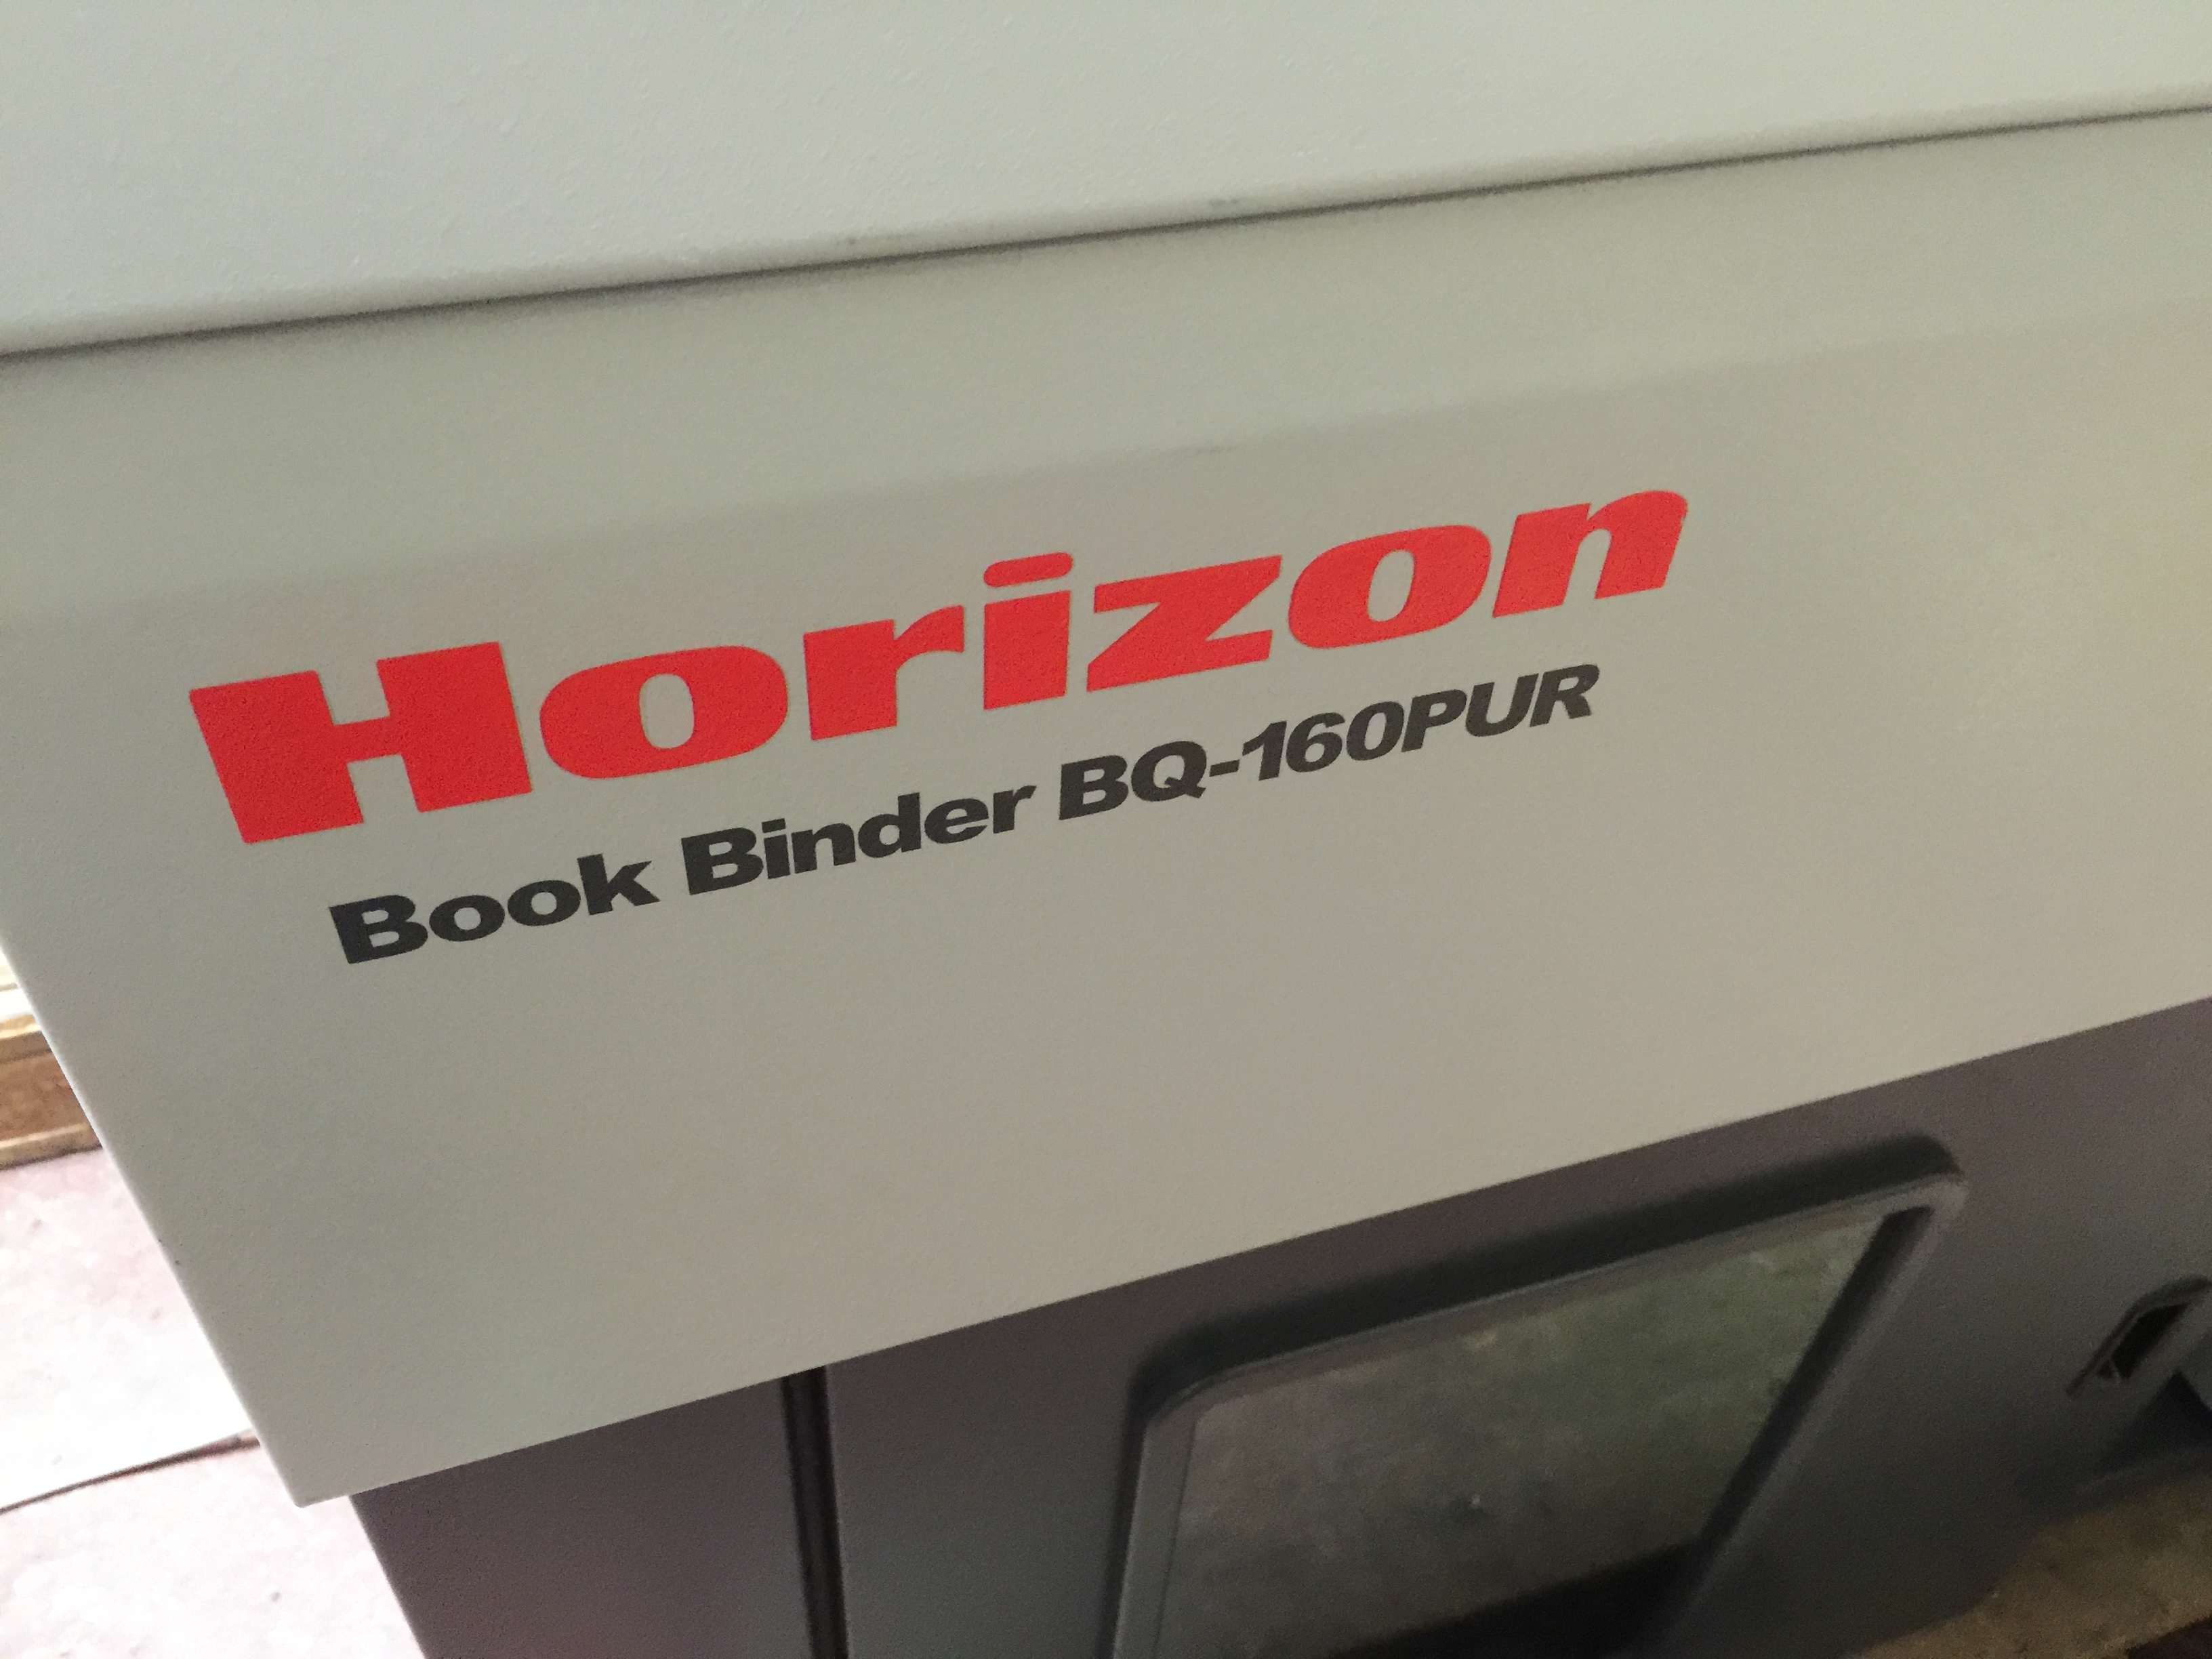 2013 Horizon Bq 160 Pur Perfect Binder